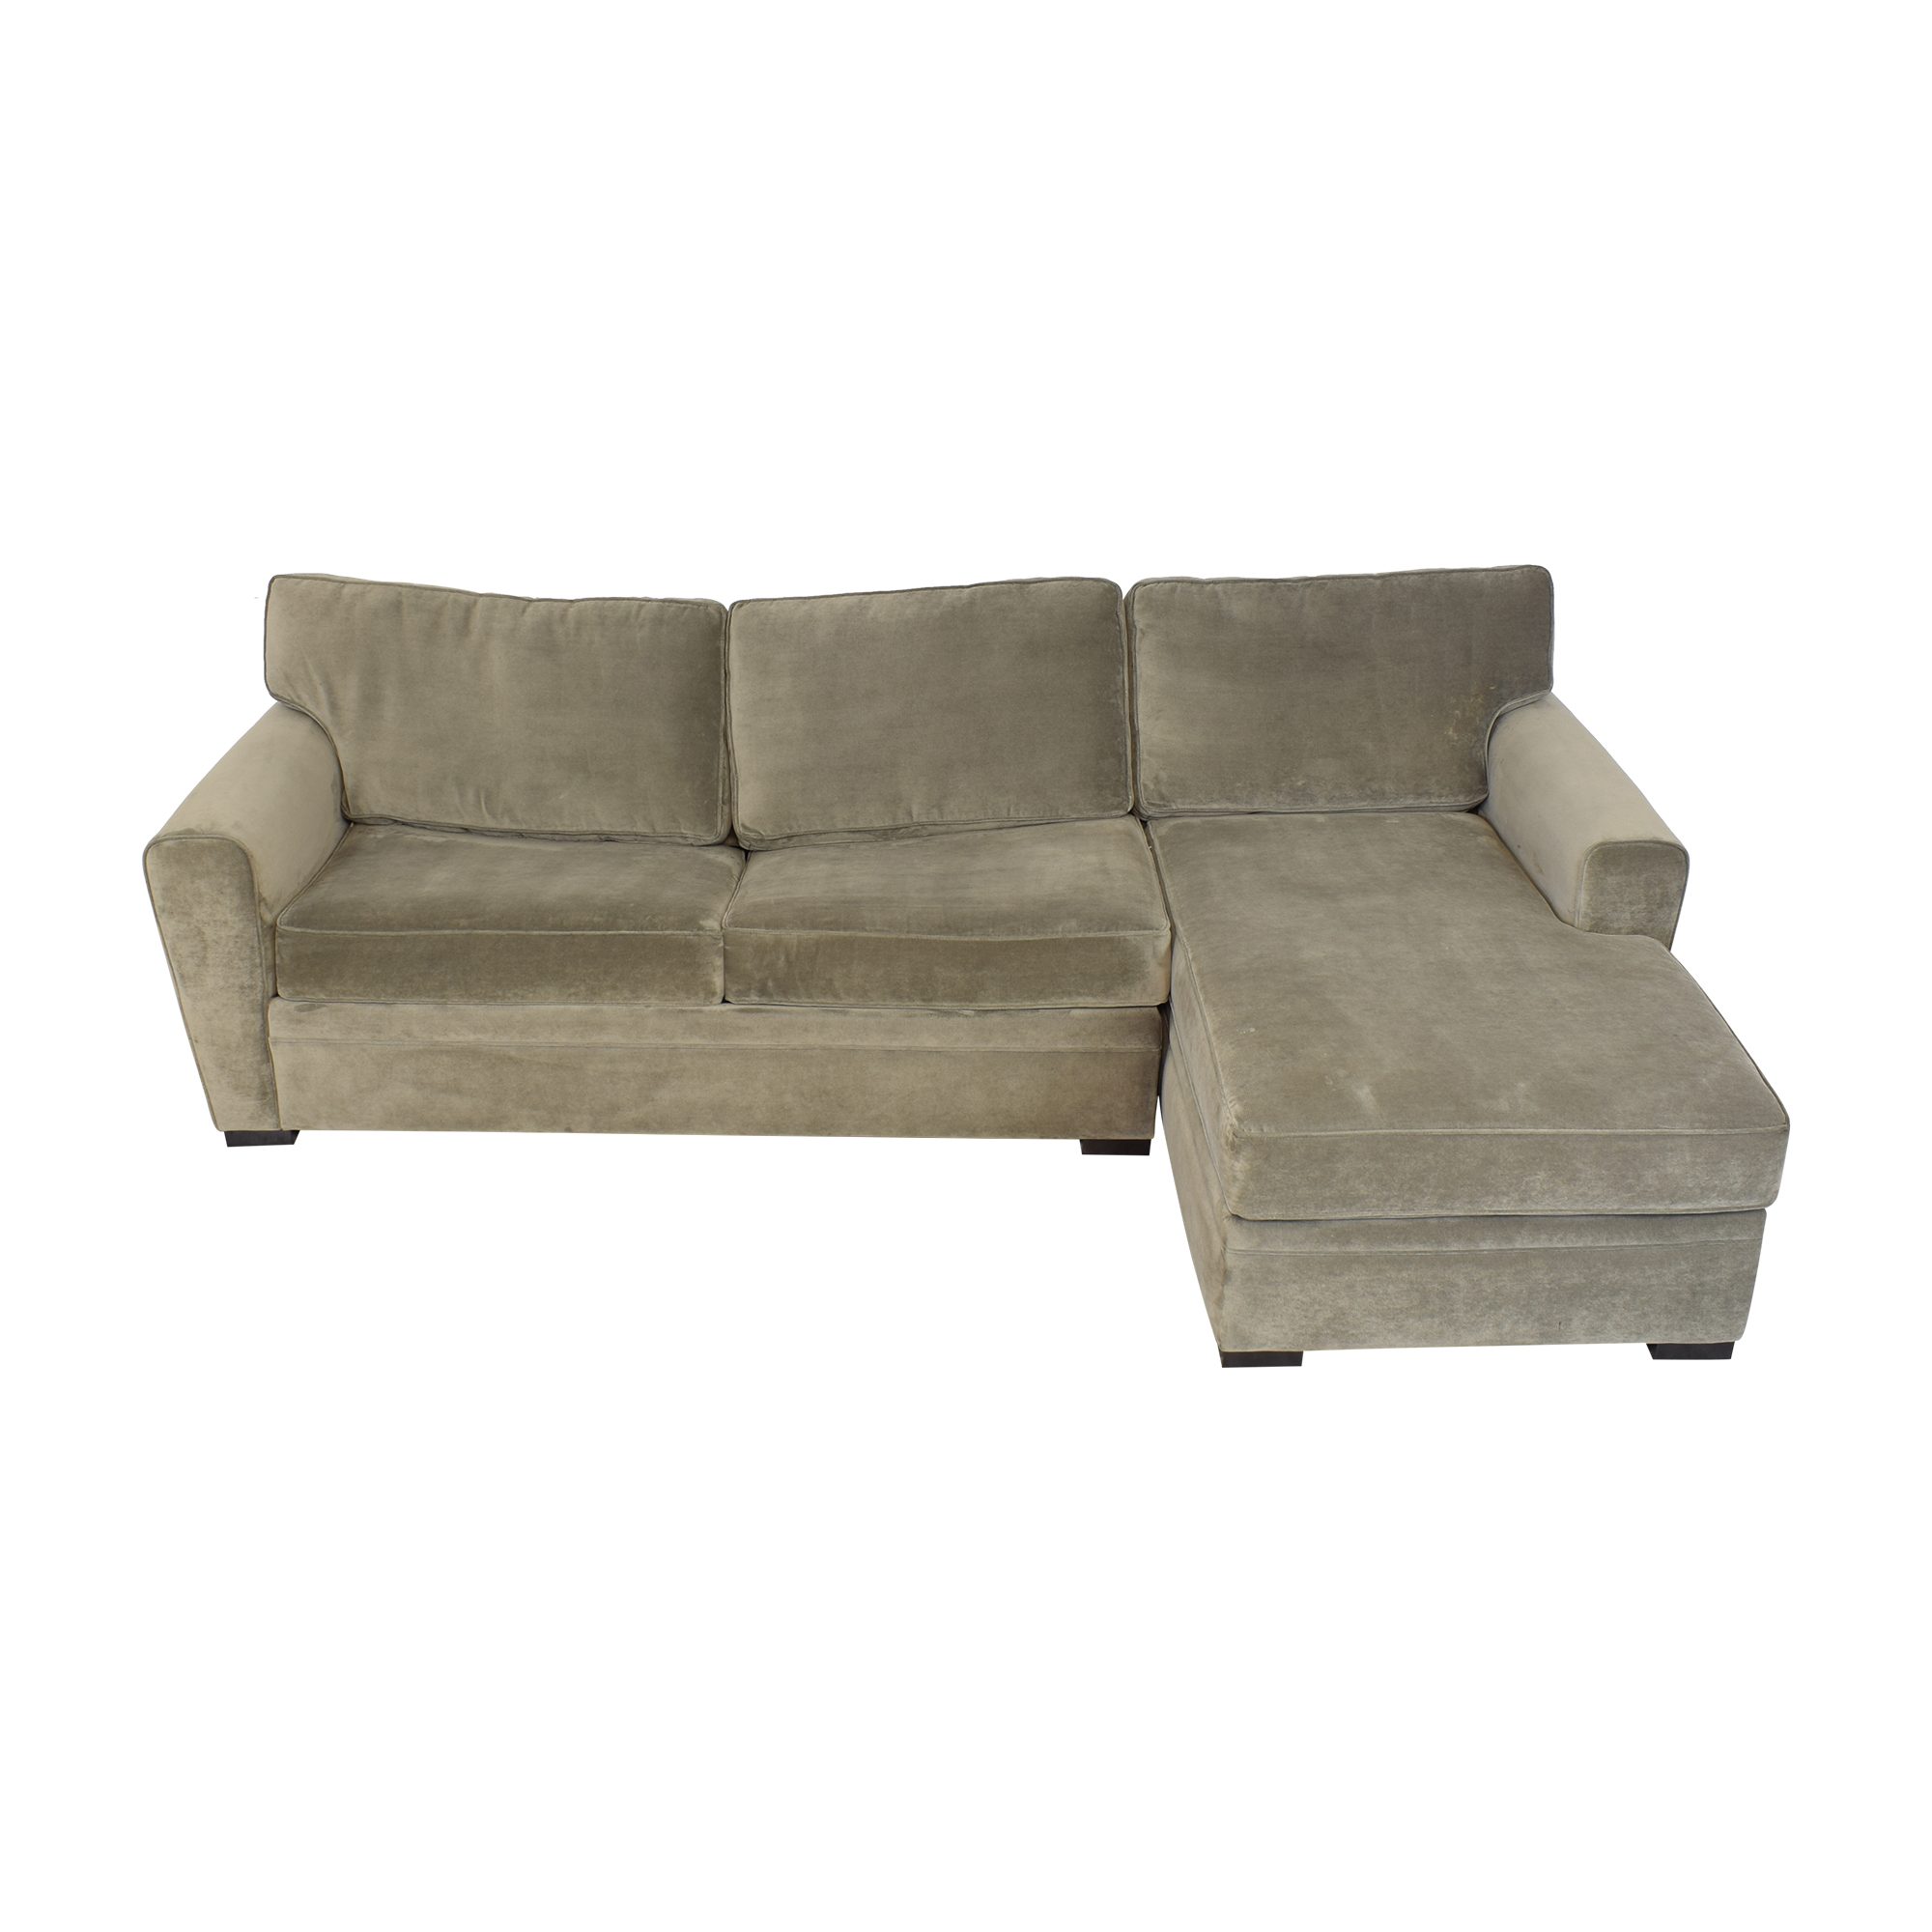 Raymour & Flanigan Raymour & Flanigan Artemis II Sectional Sofa with Sleeper discount